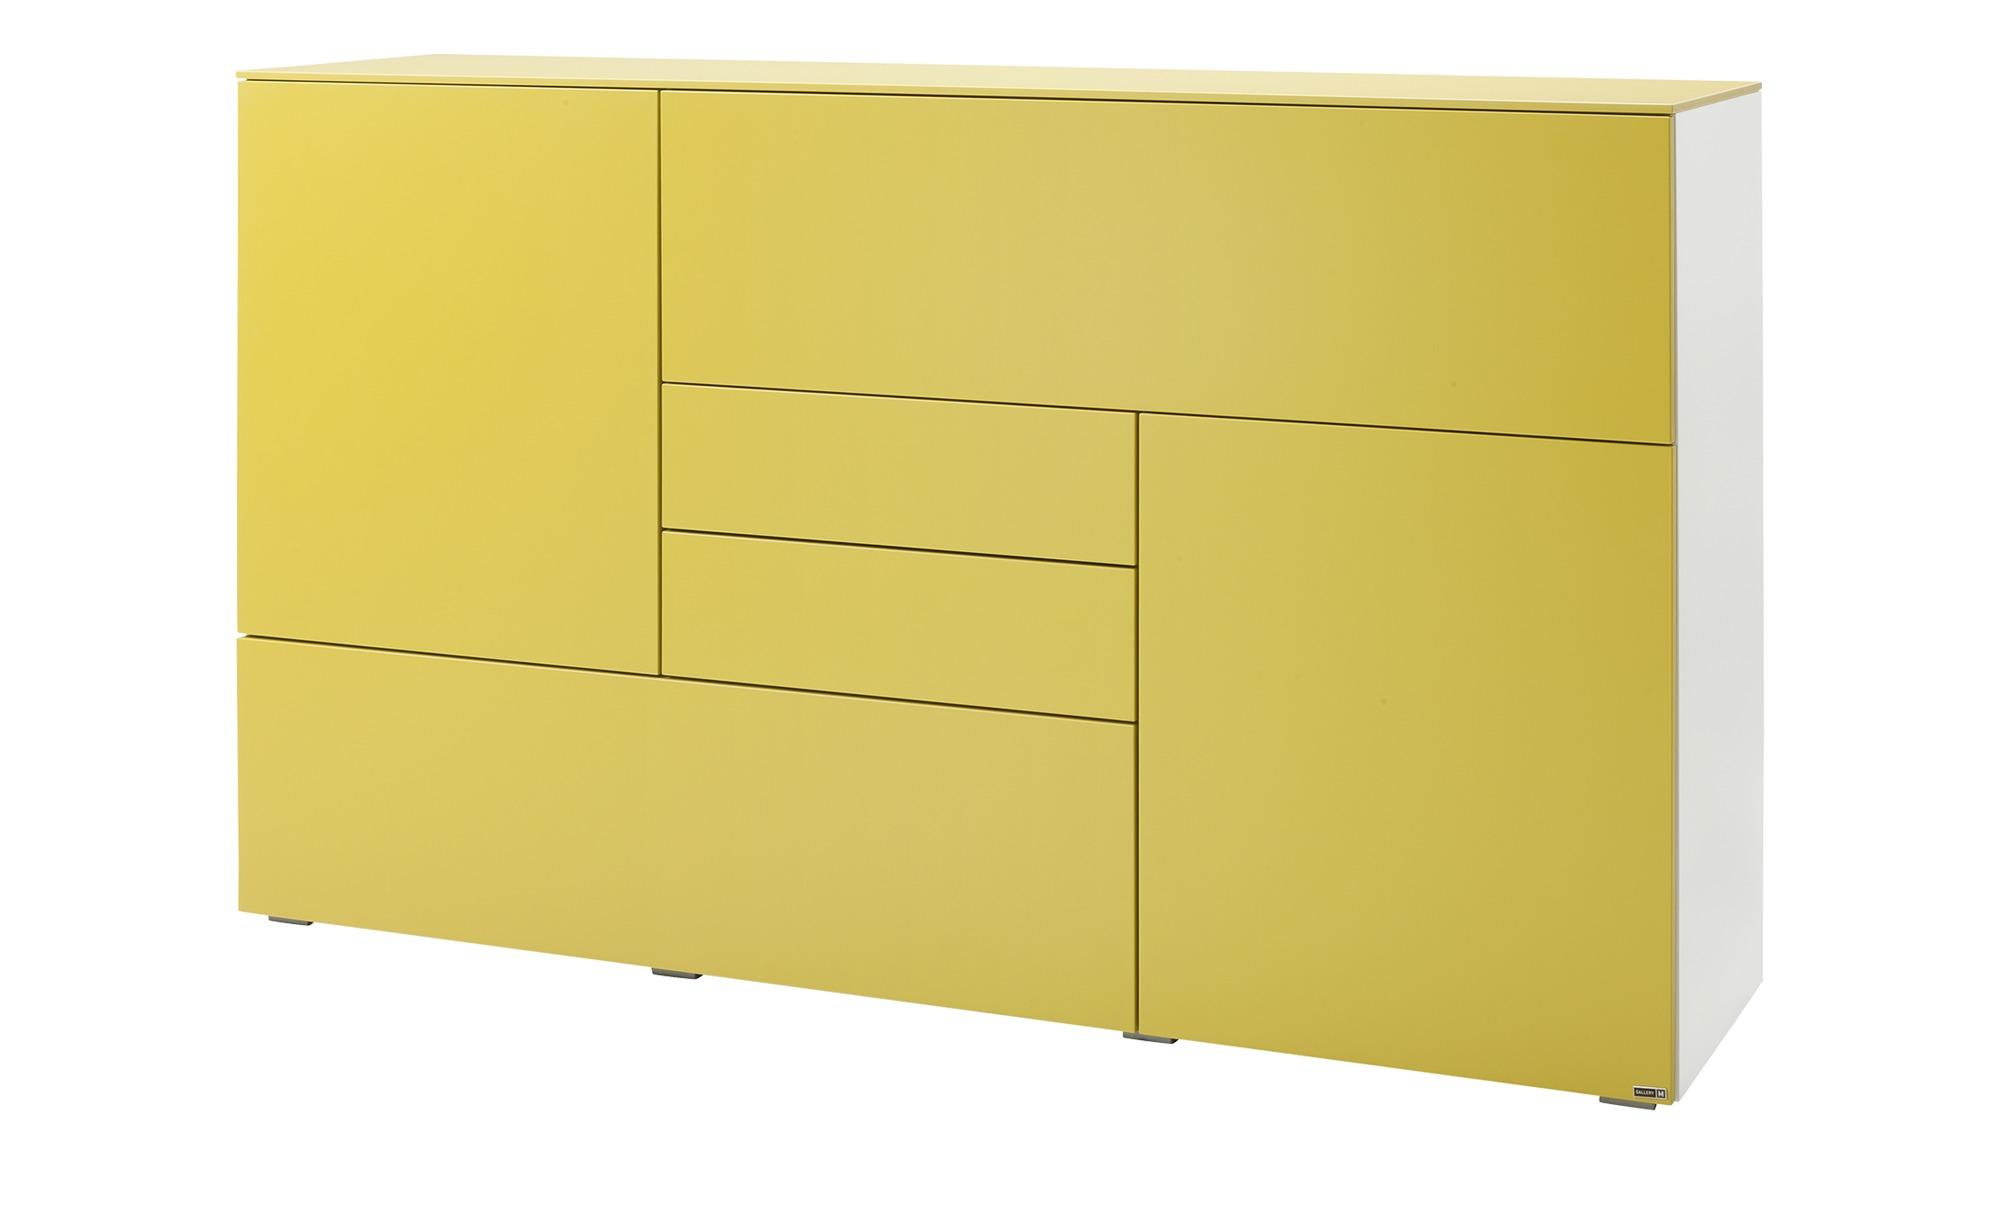 Gallery M Highboard  Merano ¦ gelb ¦ Maße (cm): B: 180 H: 109 T: 48 Kommoden & Sideboards > Highboards - Höffner